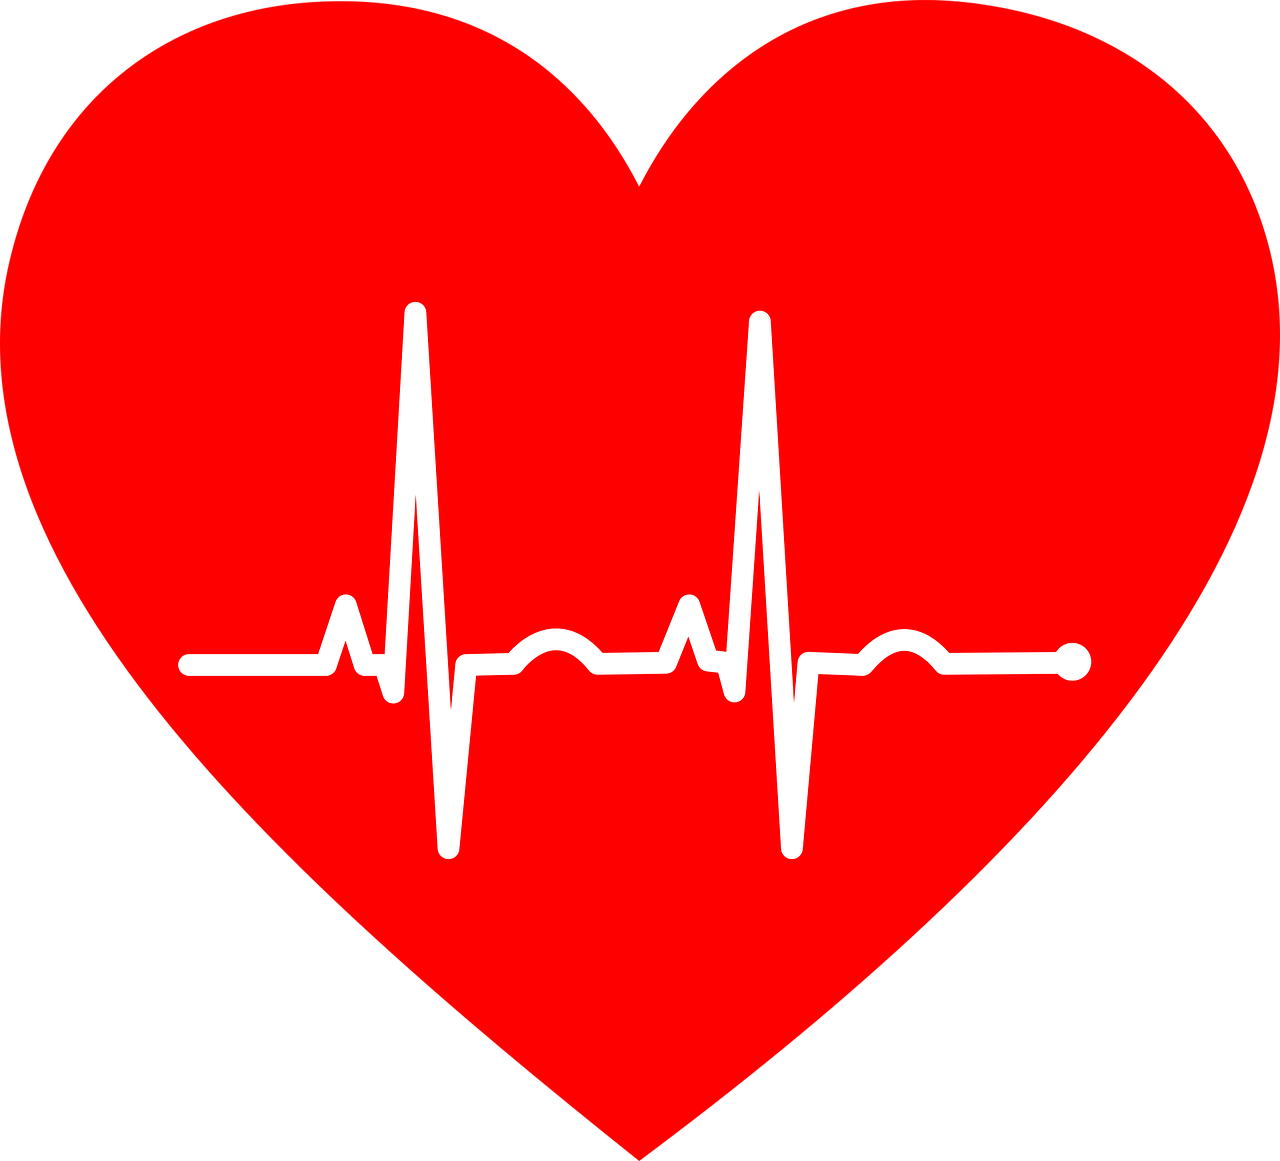 ekg, electrocardiogram, heart-2069872.jpg